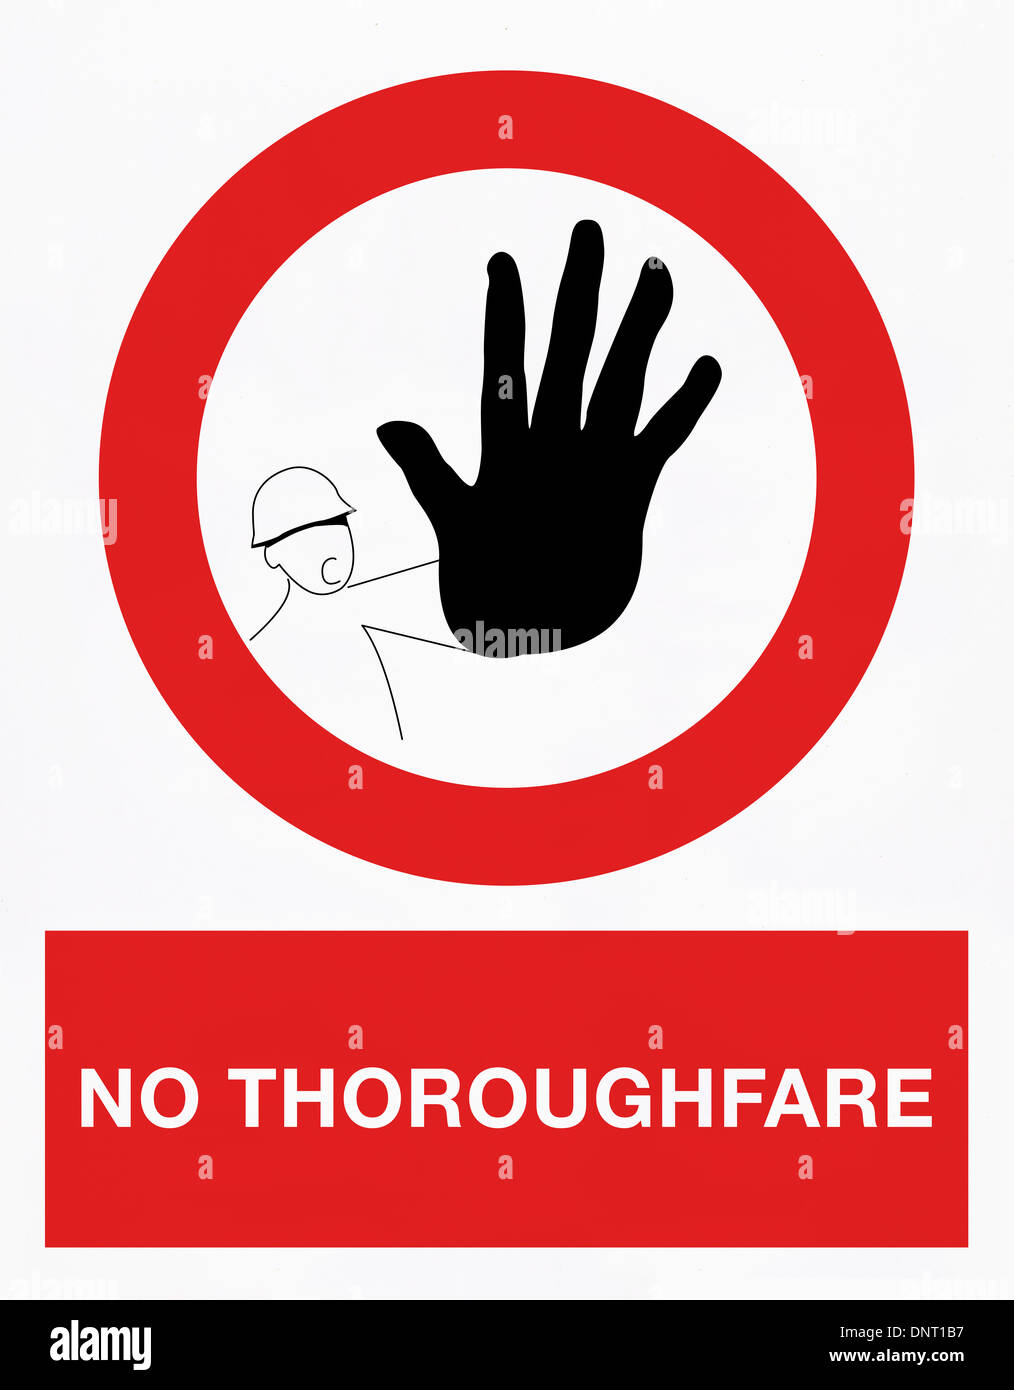 No thoroughfare signal in english language - Stock Image